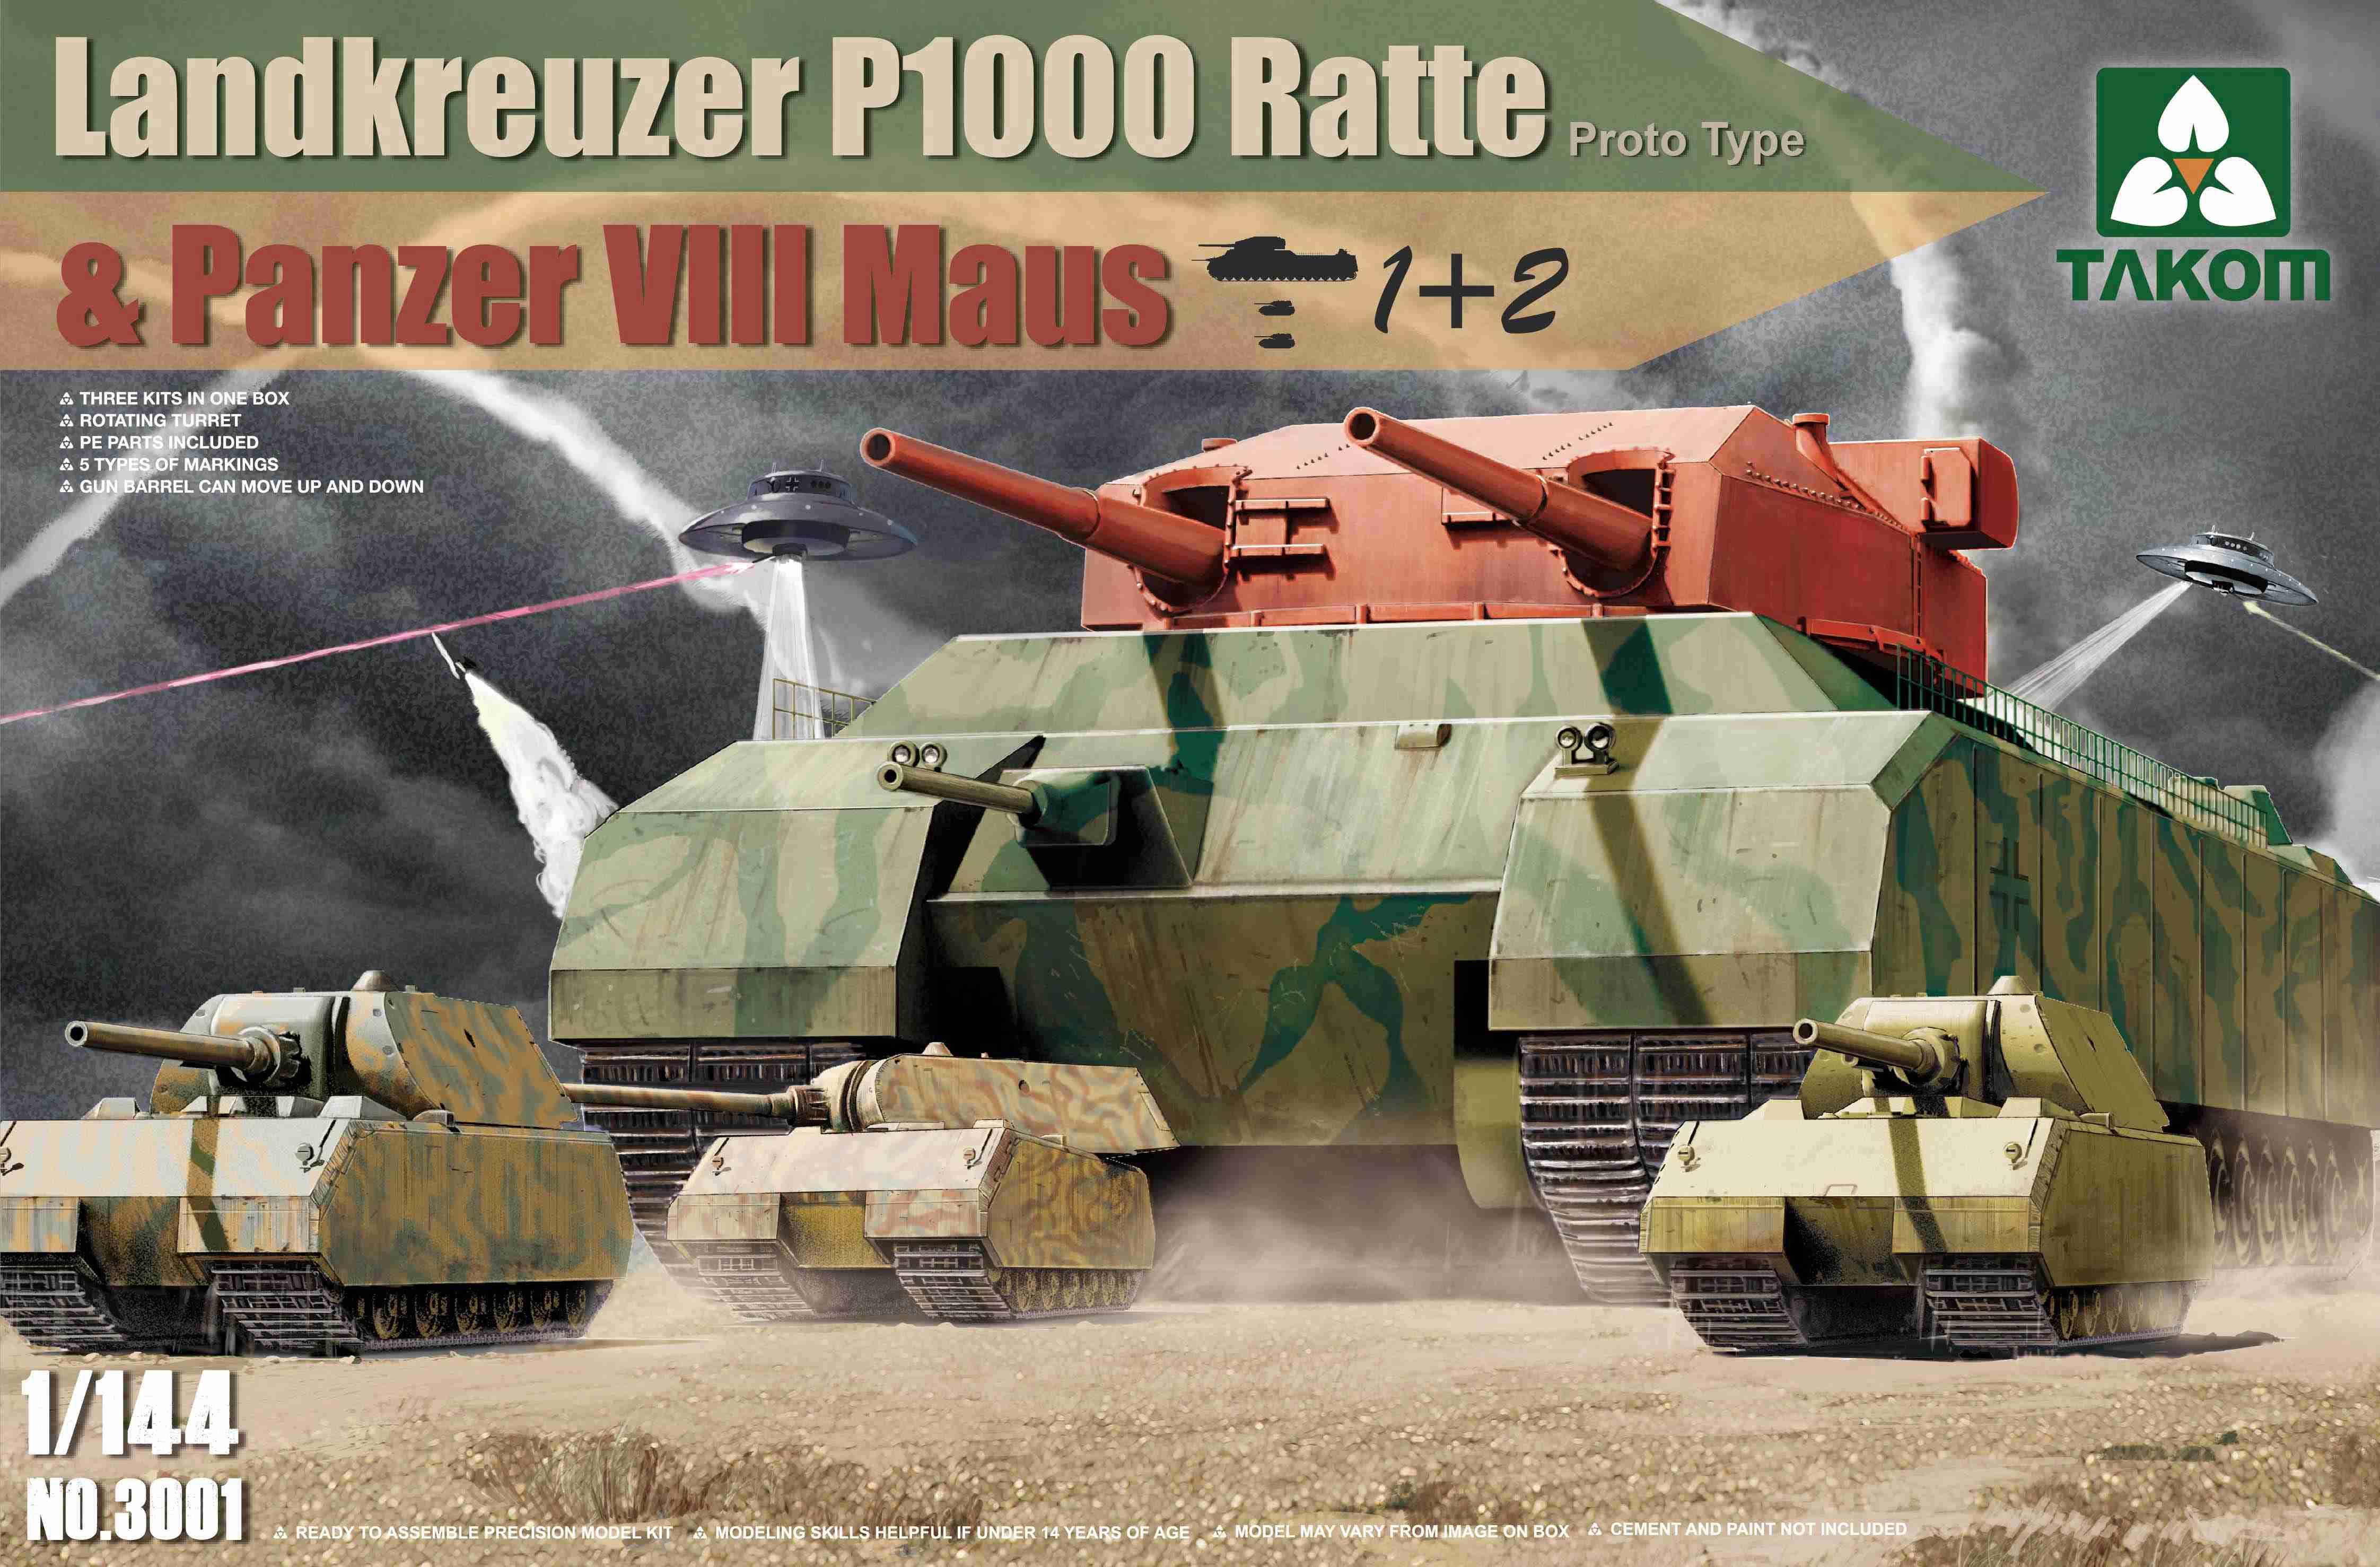 Takom 1/144 WWII Heavy Battle Tank Landkreuzer P1000 Ratte(Prototype) & Panzer VIII Maus 3in1